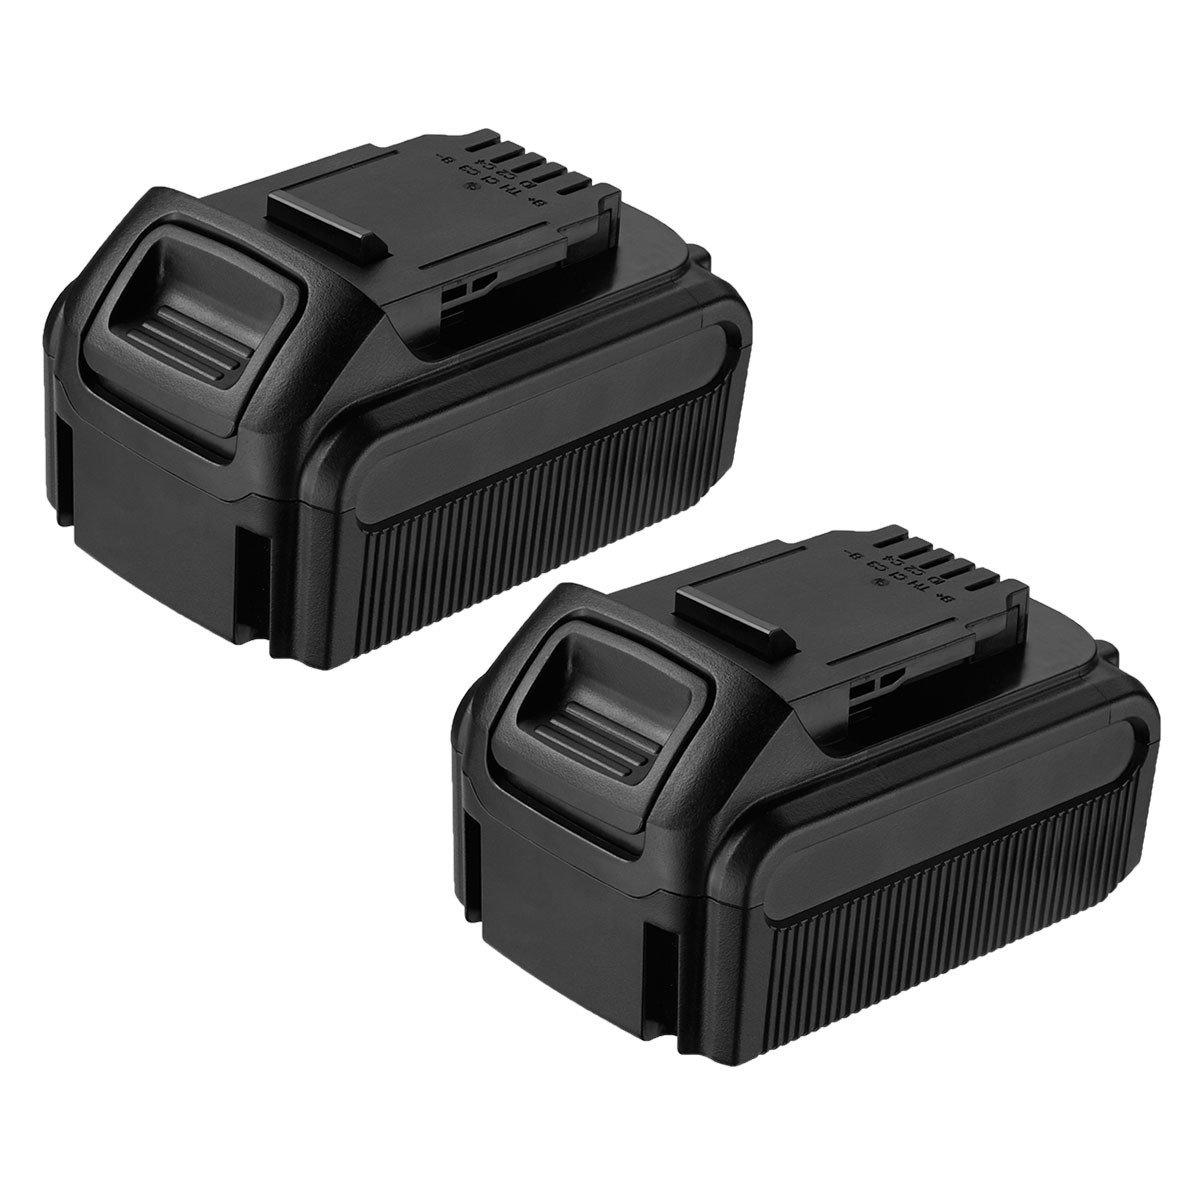 FirstPower 2 Pack 5.5Ah Dewalt 20V Max XR Lithium Ion Replacement Battery for XR DCB205 DCB205-2 DCB204 DCB203 DCB201 DCS380B DCD/DCF/DCG/DCS Series 20V Dewalt Battery